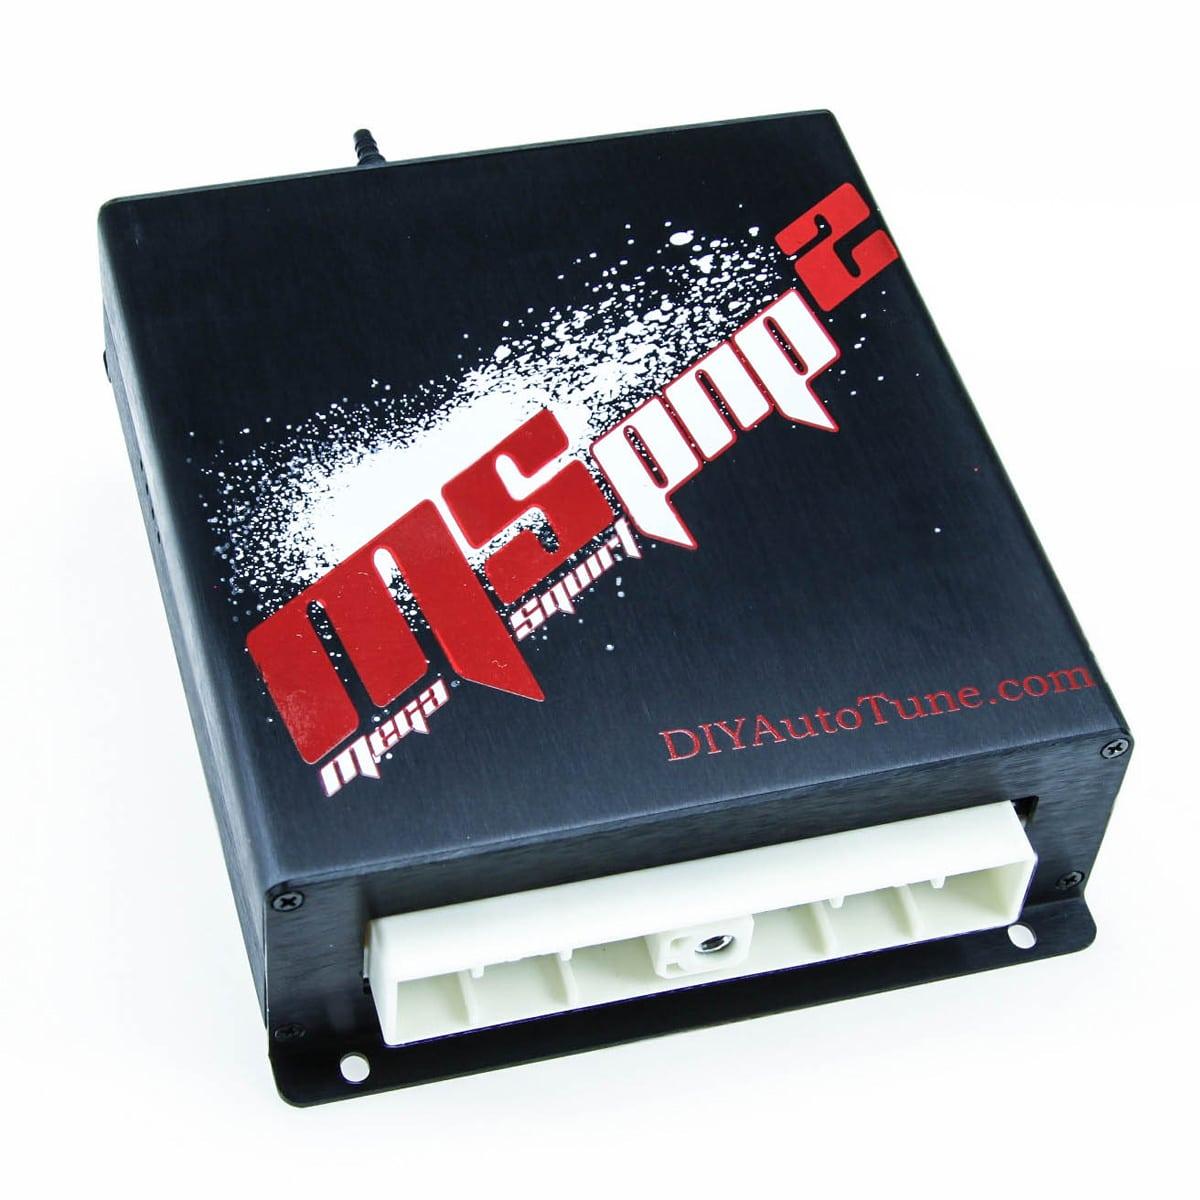 MegaSquirtPNP G2 NS9501b for 96-98 Nissan 240SX - Manual Trans